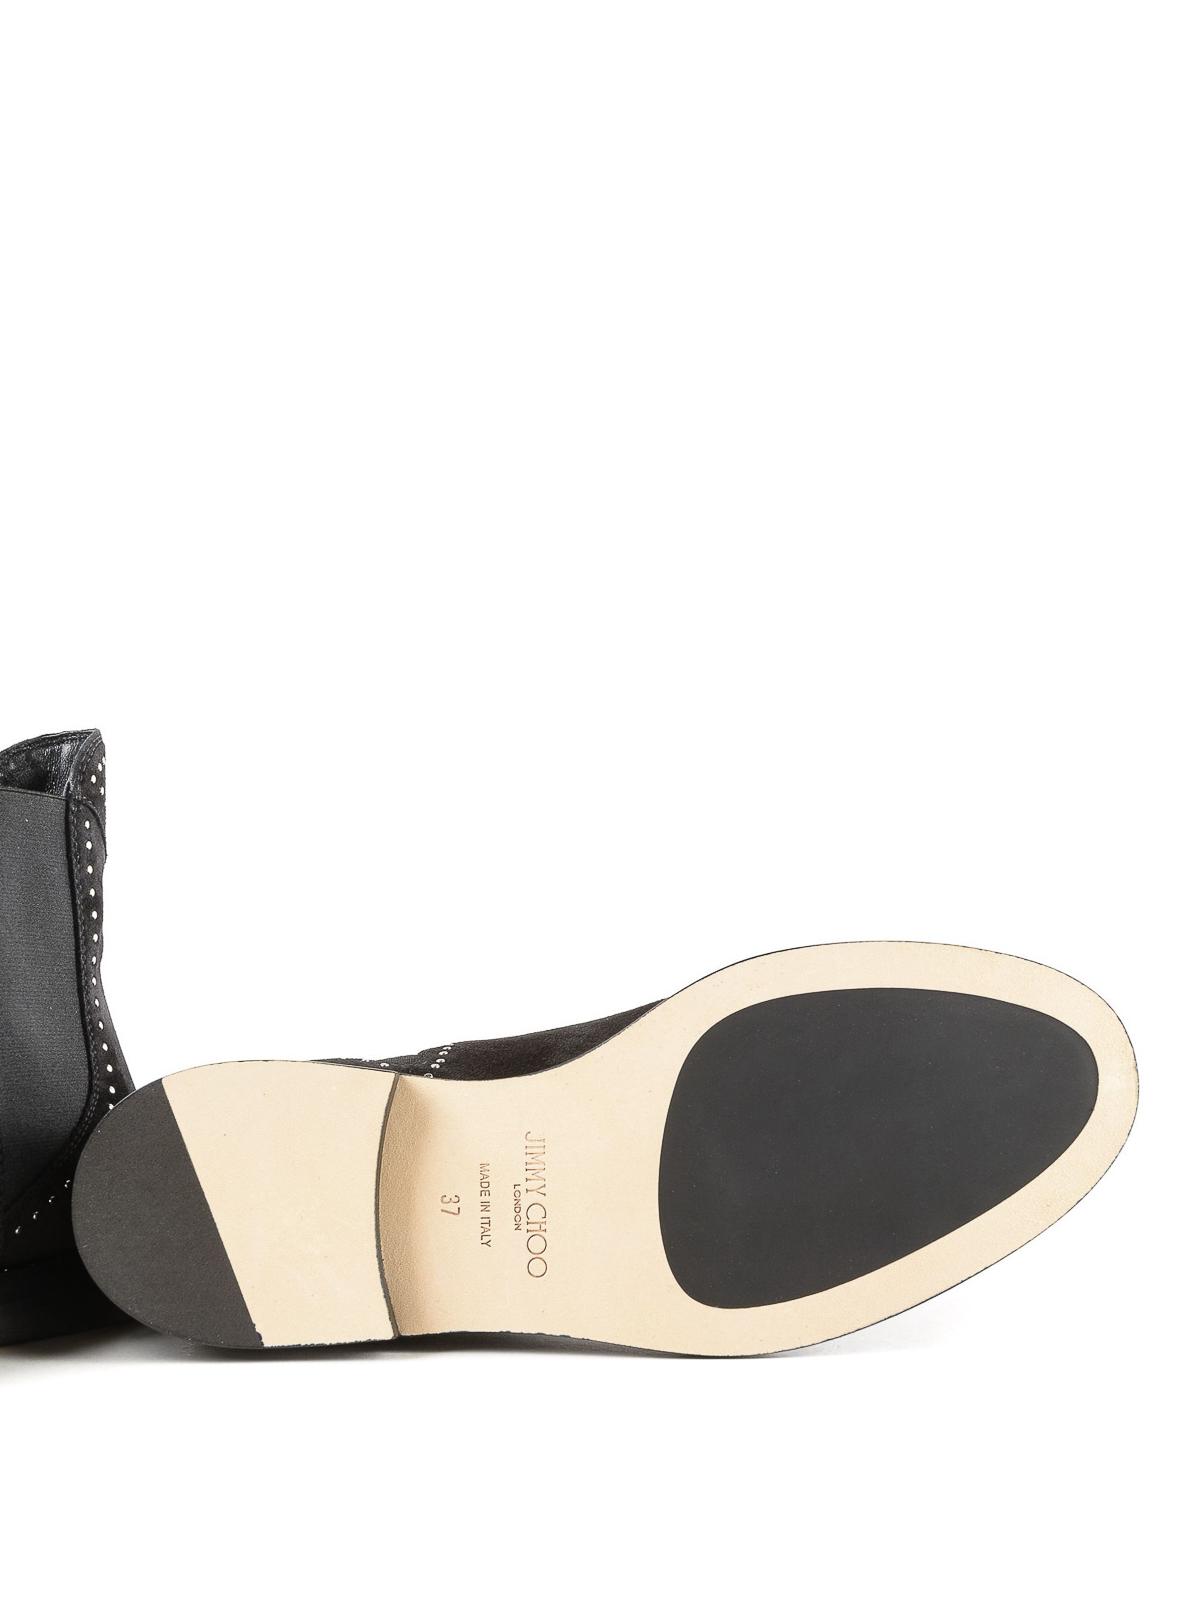 3e235432013 JIMMY CHOO buy online Merril stud detail suede flat booties · JIMMY CHOO  ankle  boots ...